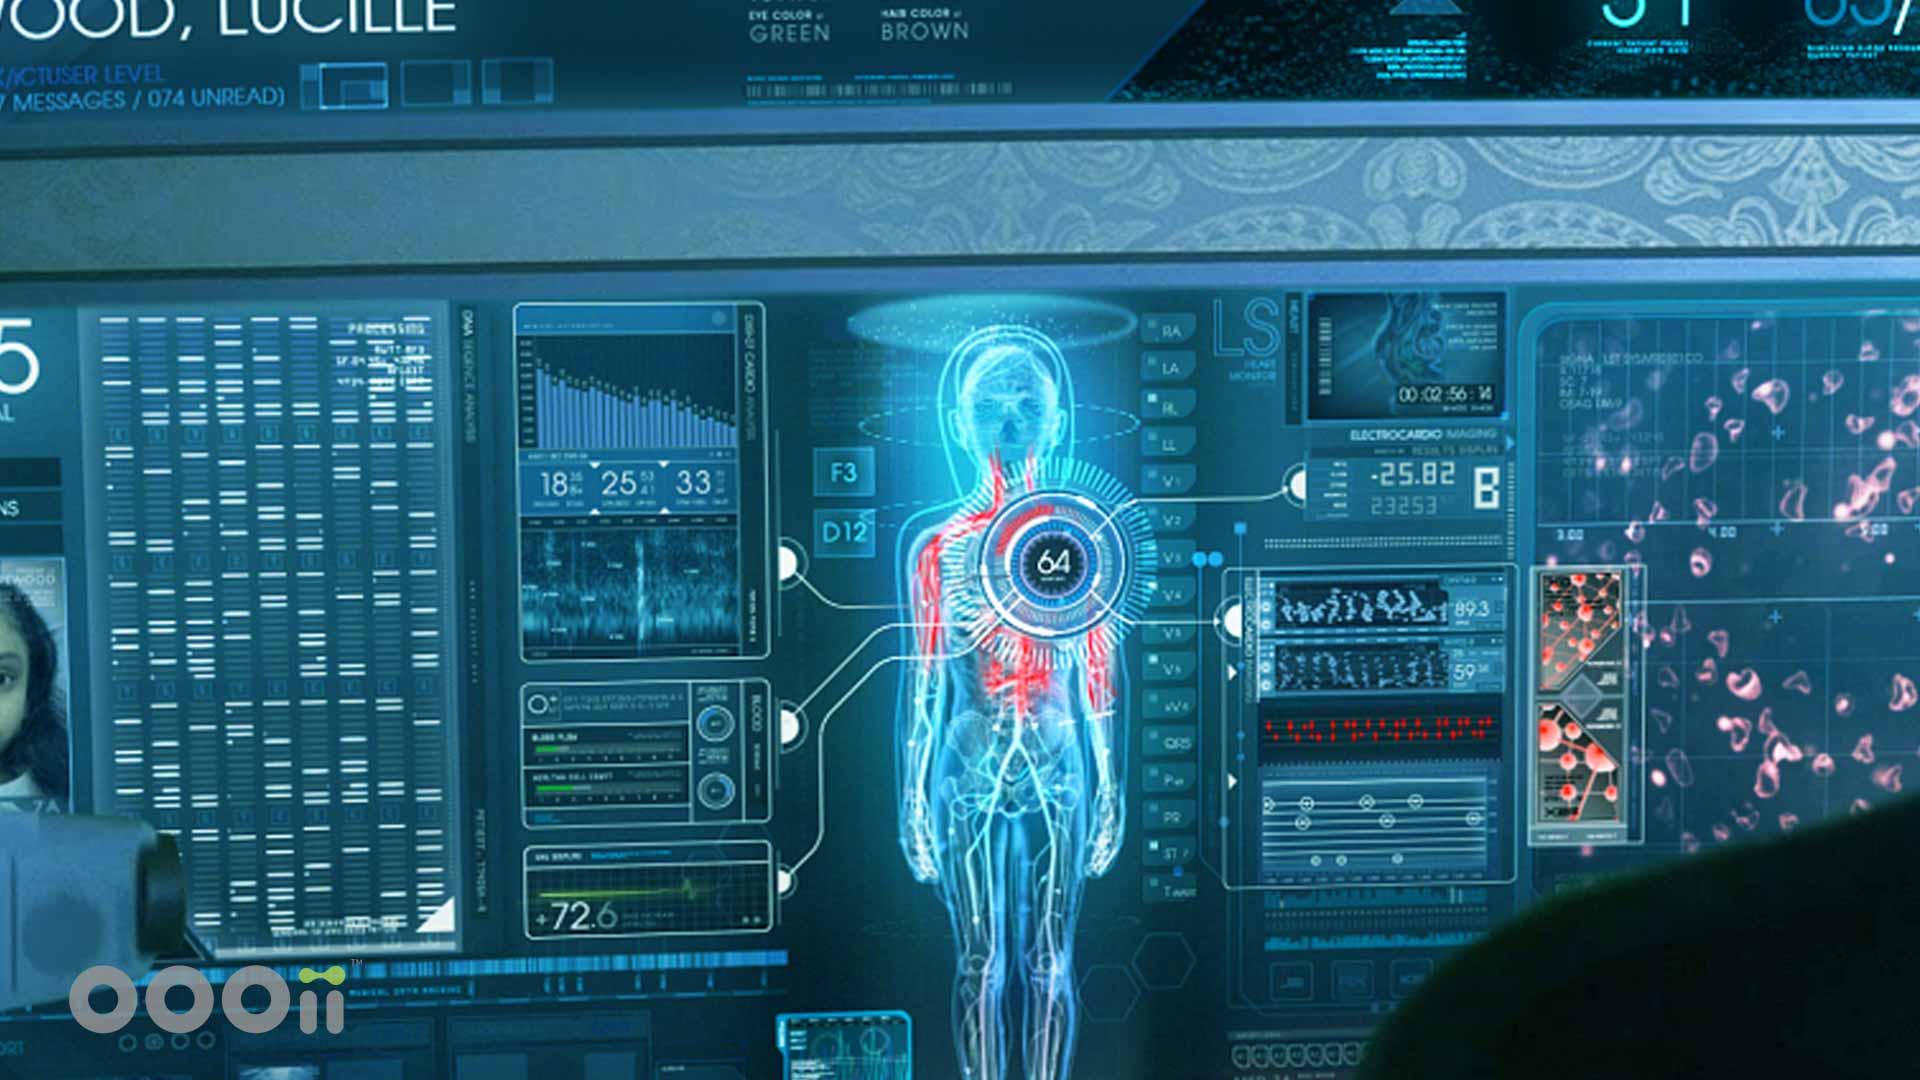 startrek_medical_wall_interface_draft_bg.jpg